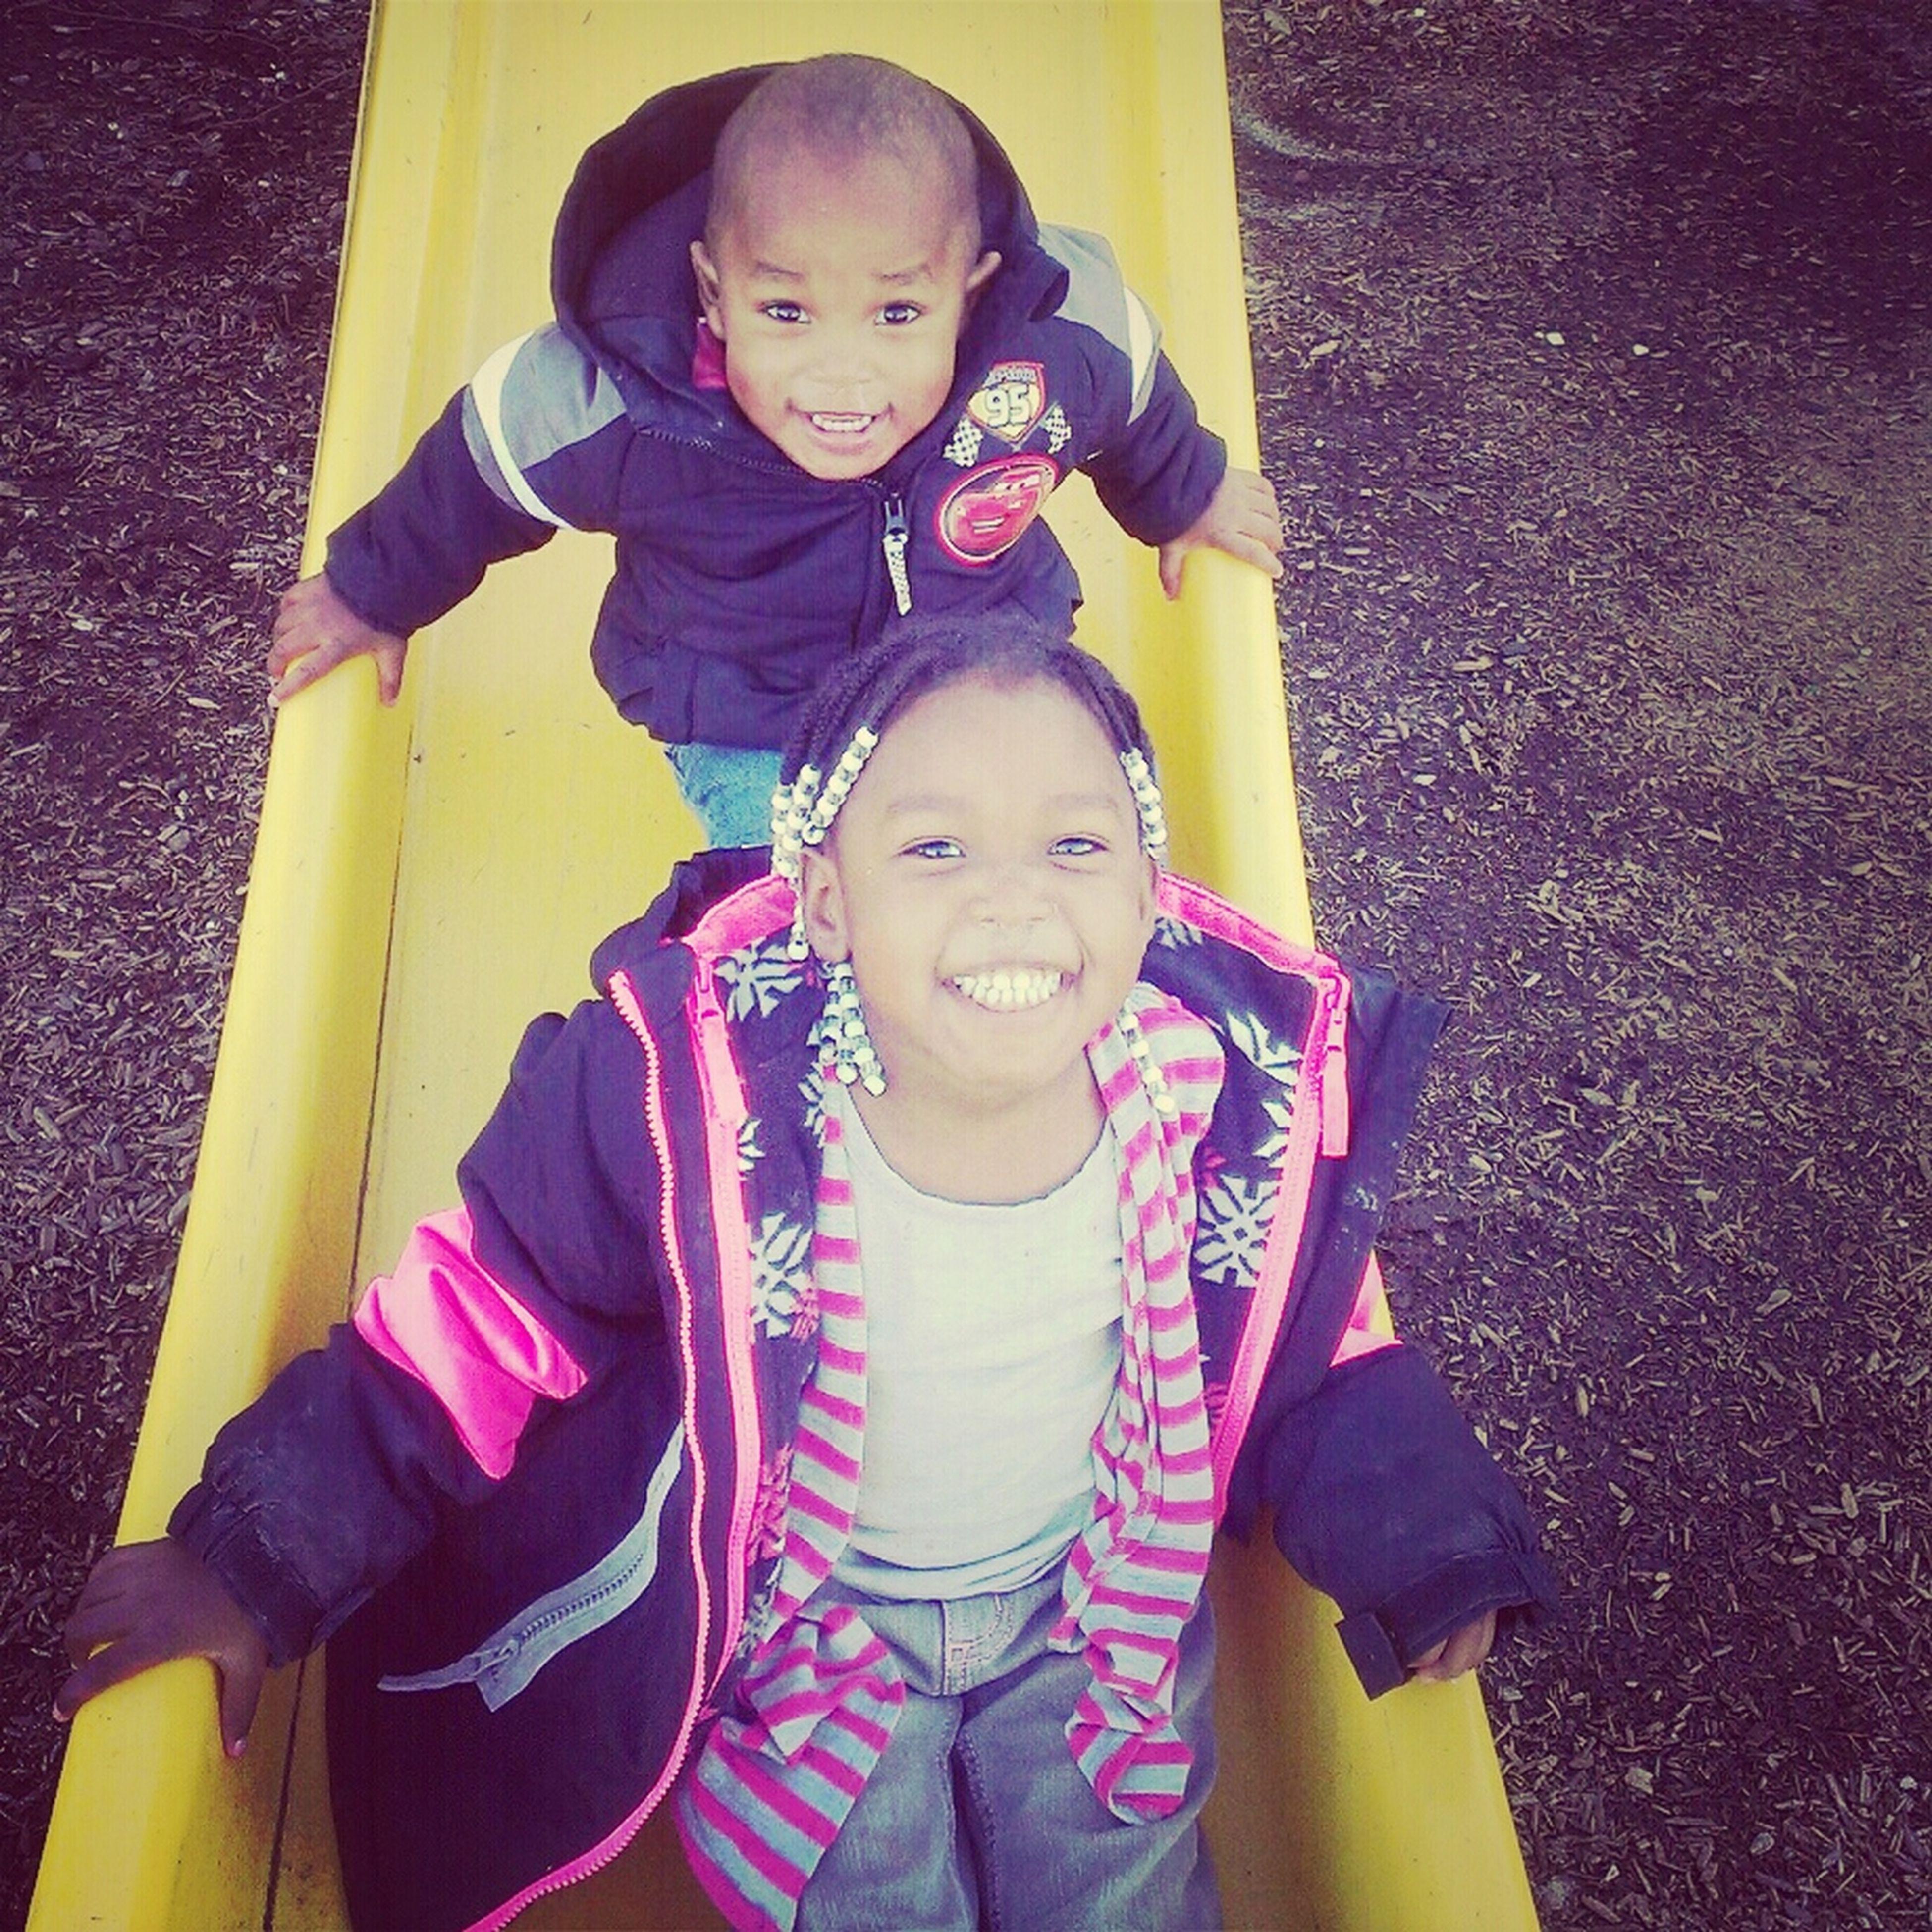 Playground Fun With The Kids